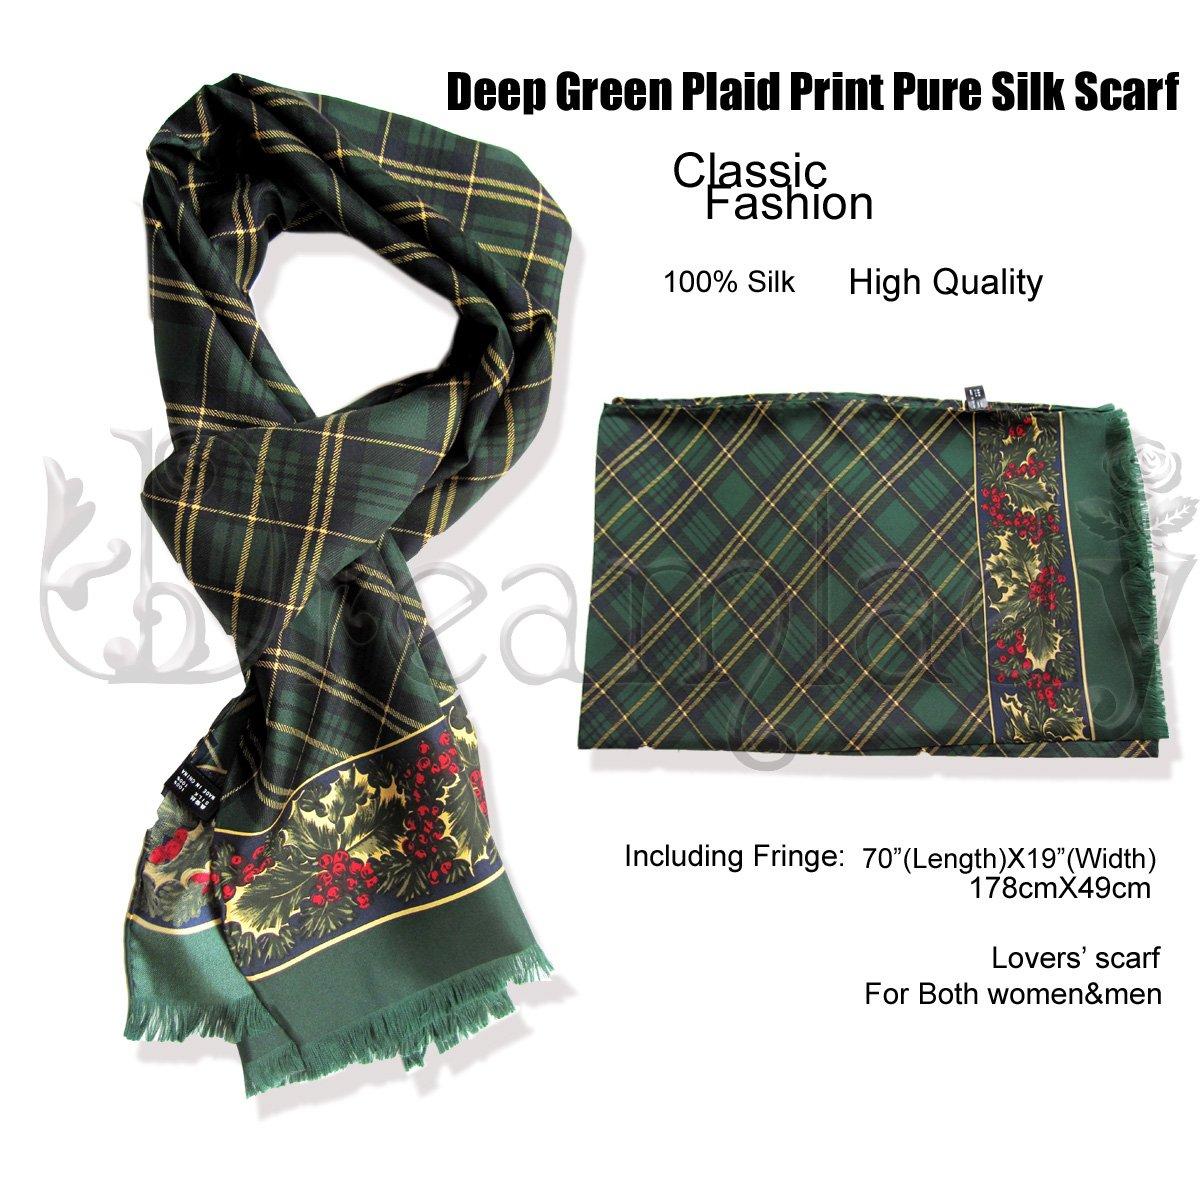 Fantastic Vintage Deep Green Unisex Plaid Print Pure Silk Scarf/Shawl